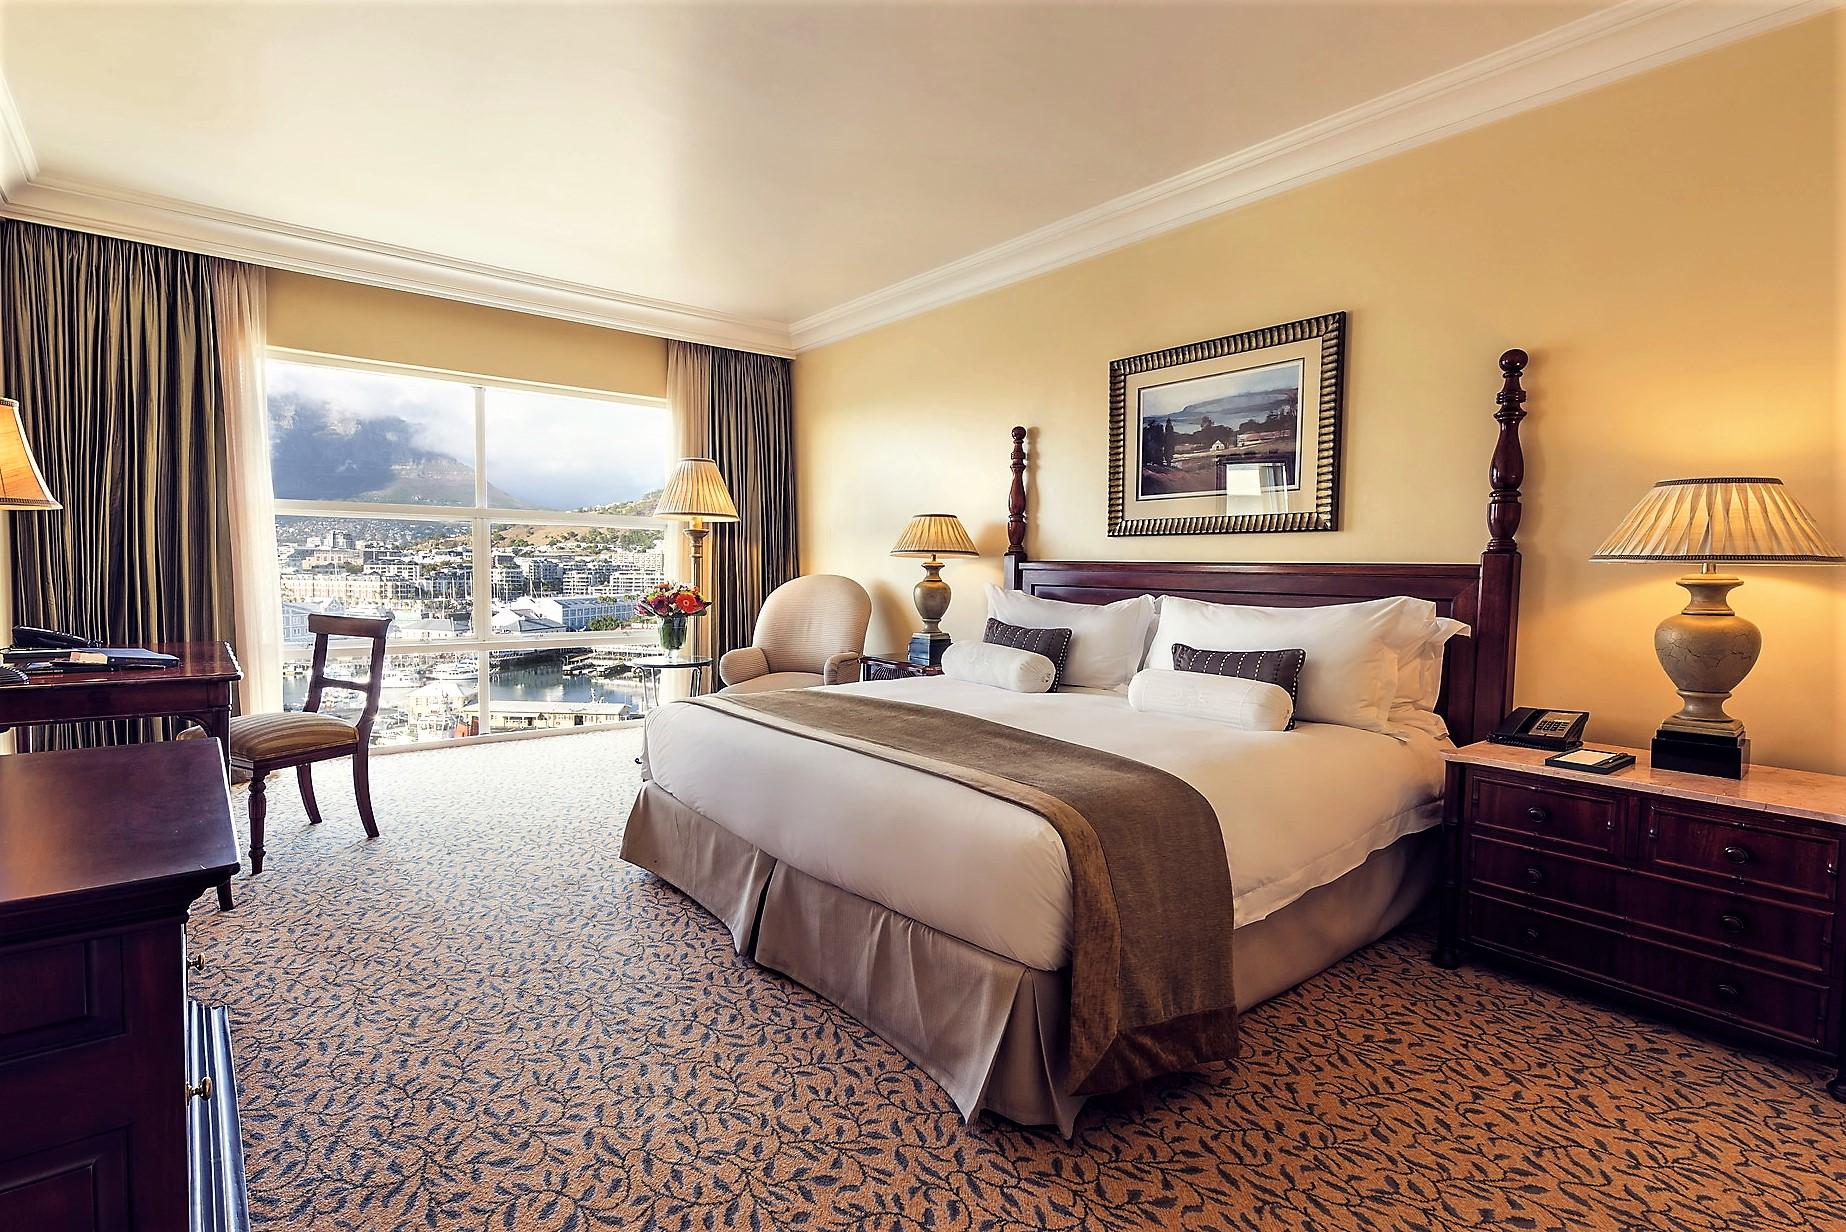 Tabel Bay hotel